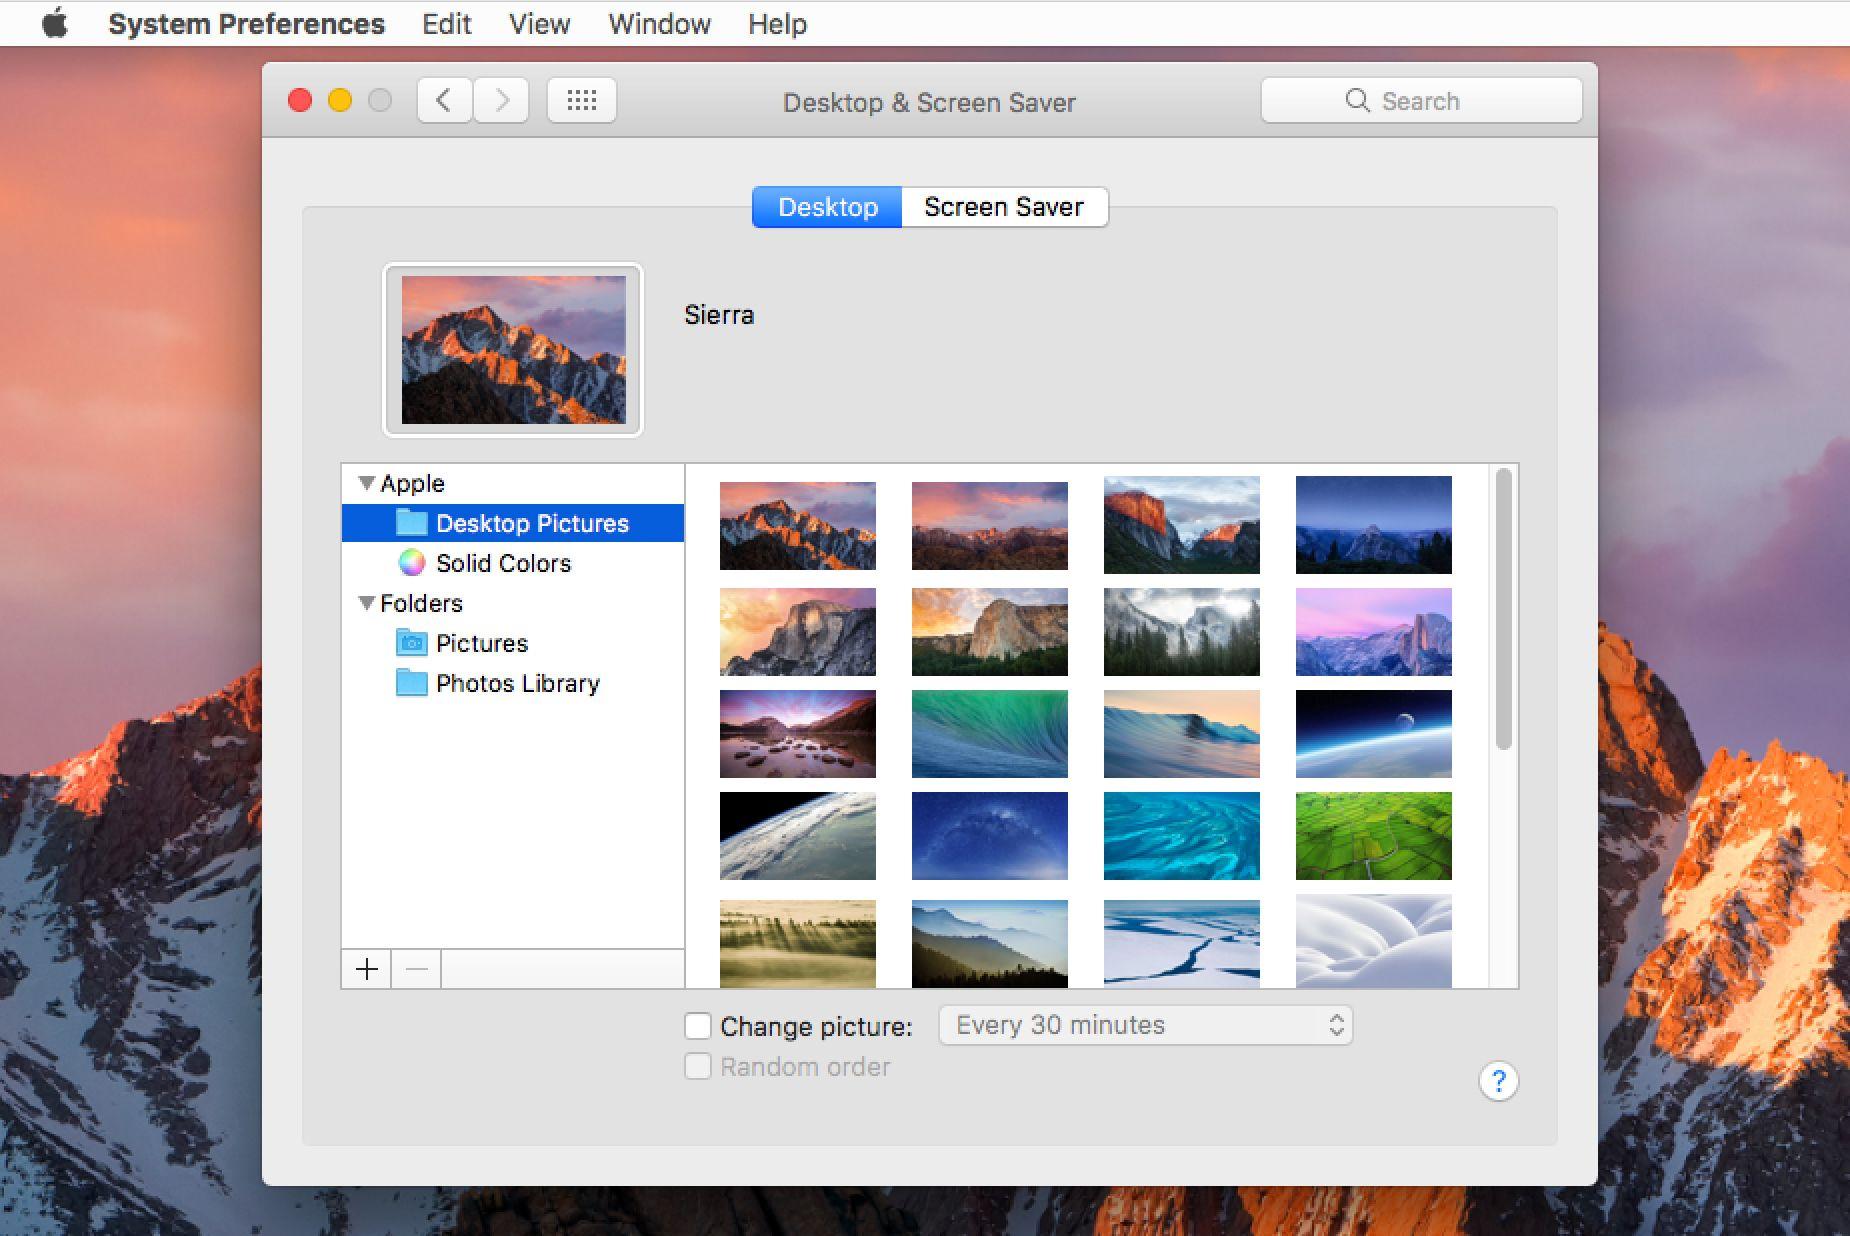 desktopscreensaver 58ae11835f9b58a3c92d0993